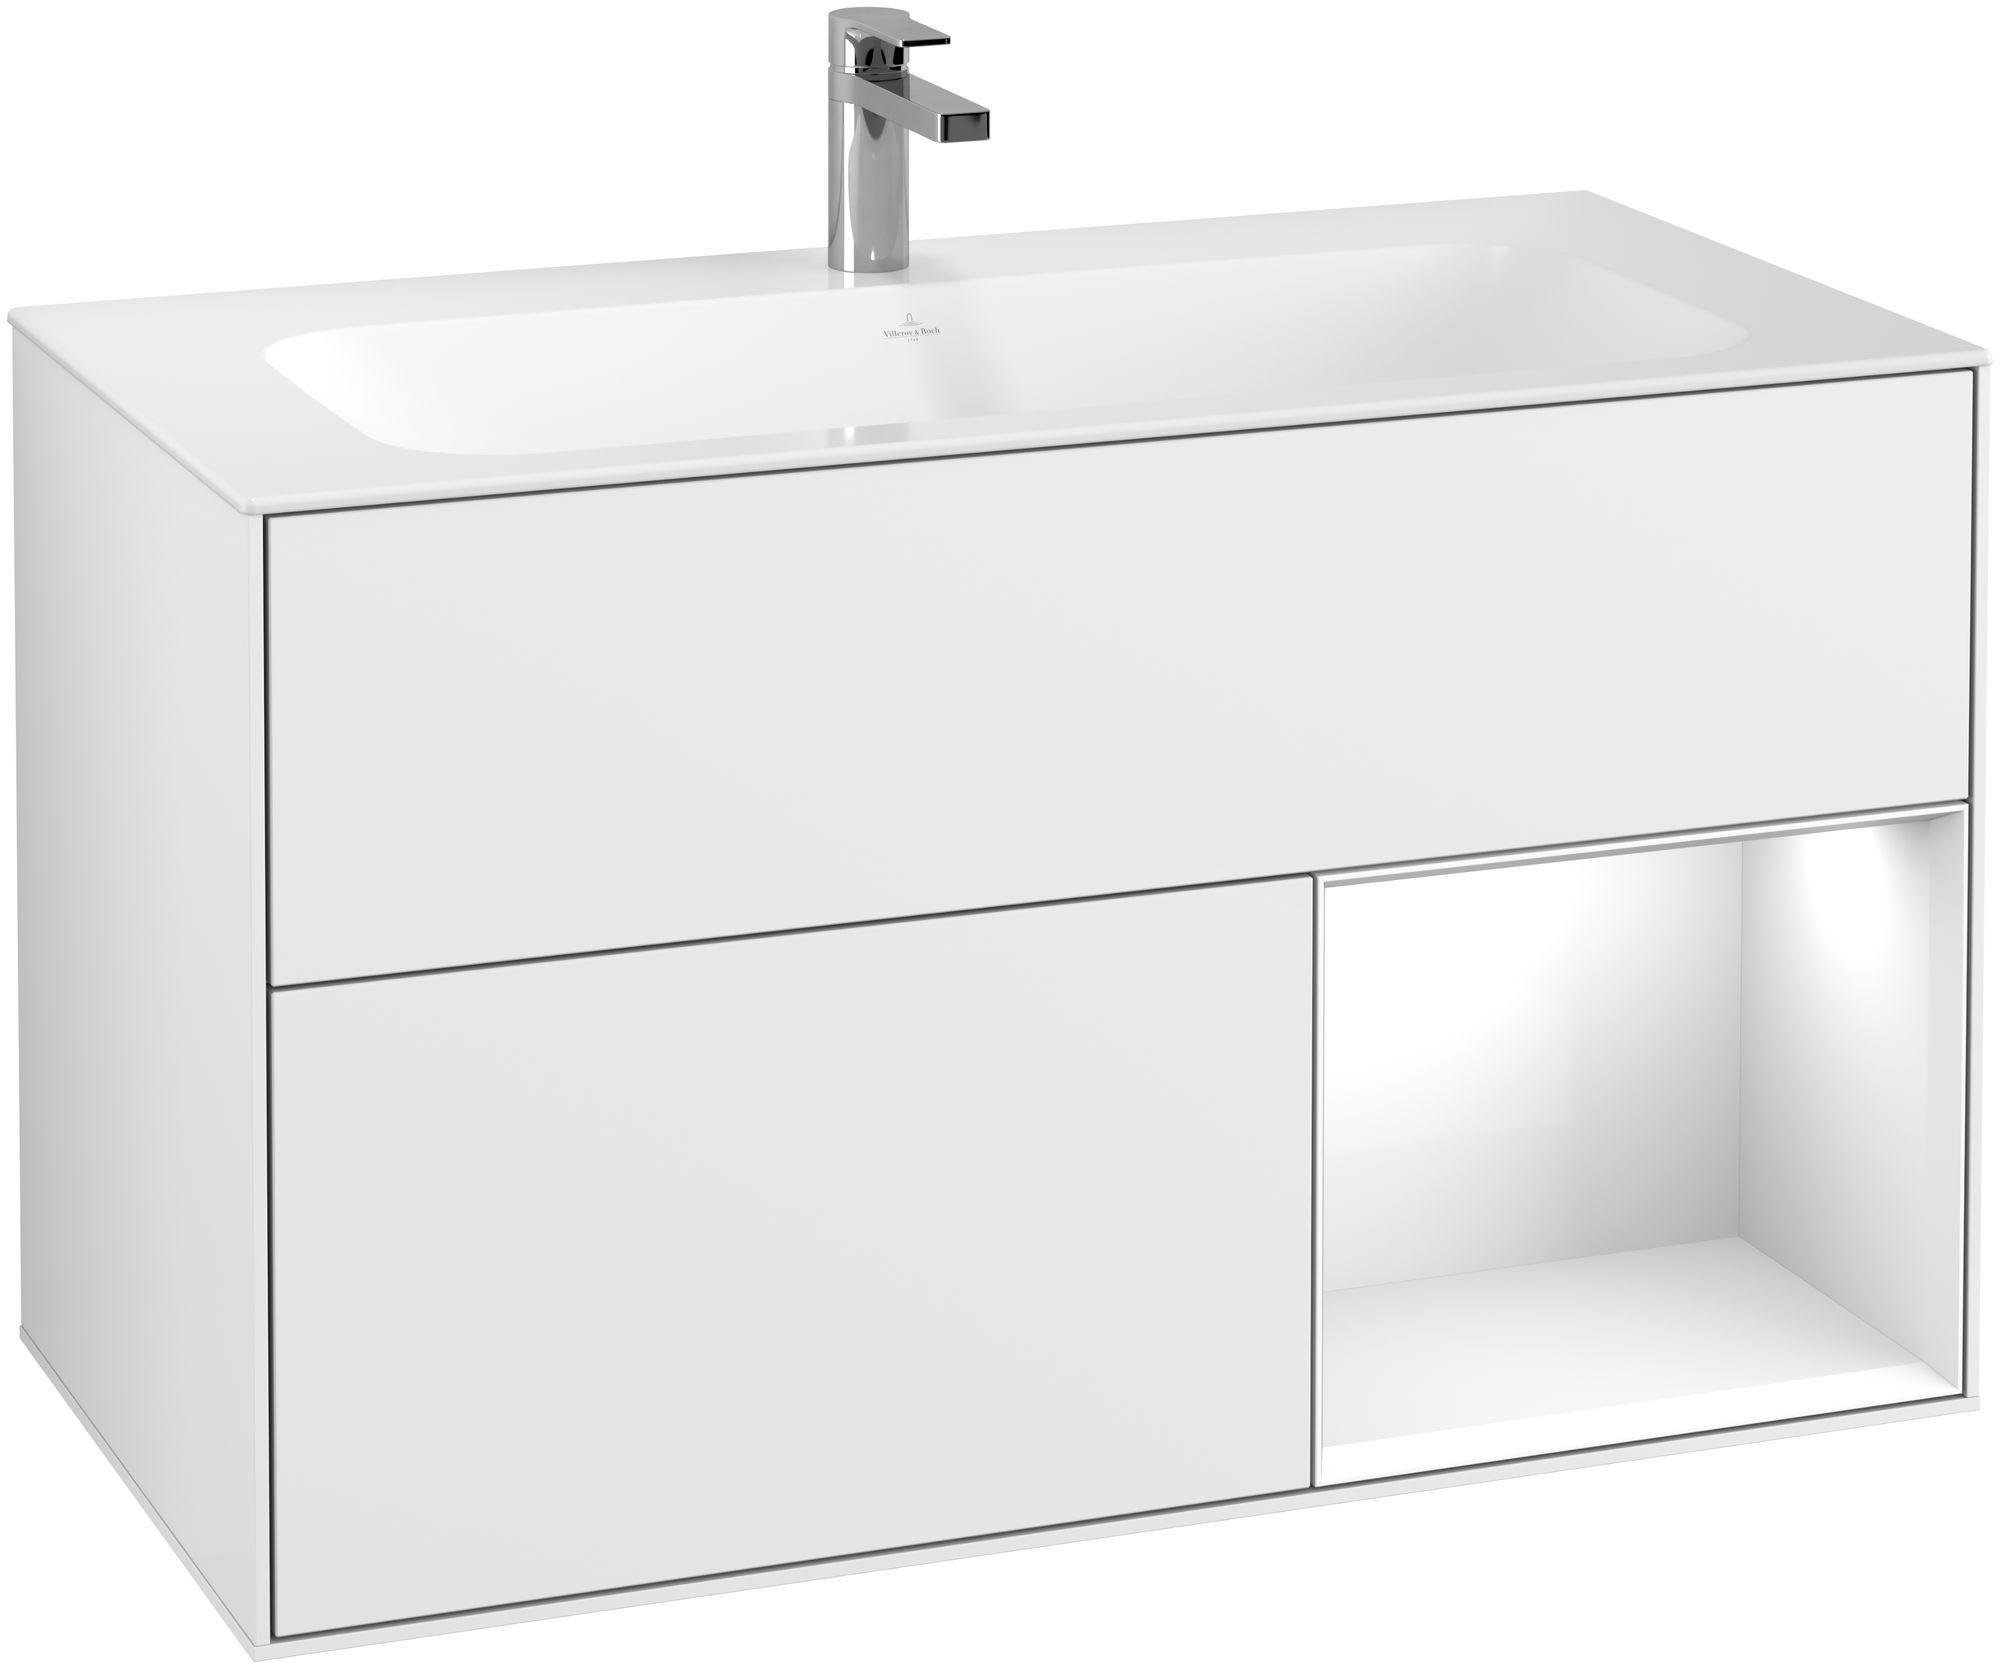 Villeroy & Boch Finion F04 Waschtischunterschrank mit Regalelement 2 Auszüge LED-Beleuchtung B:99,6xH:59,1xT:49,8cm Front, Korpus: Glossy White Lack F040GFGF